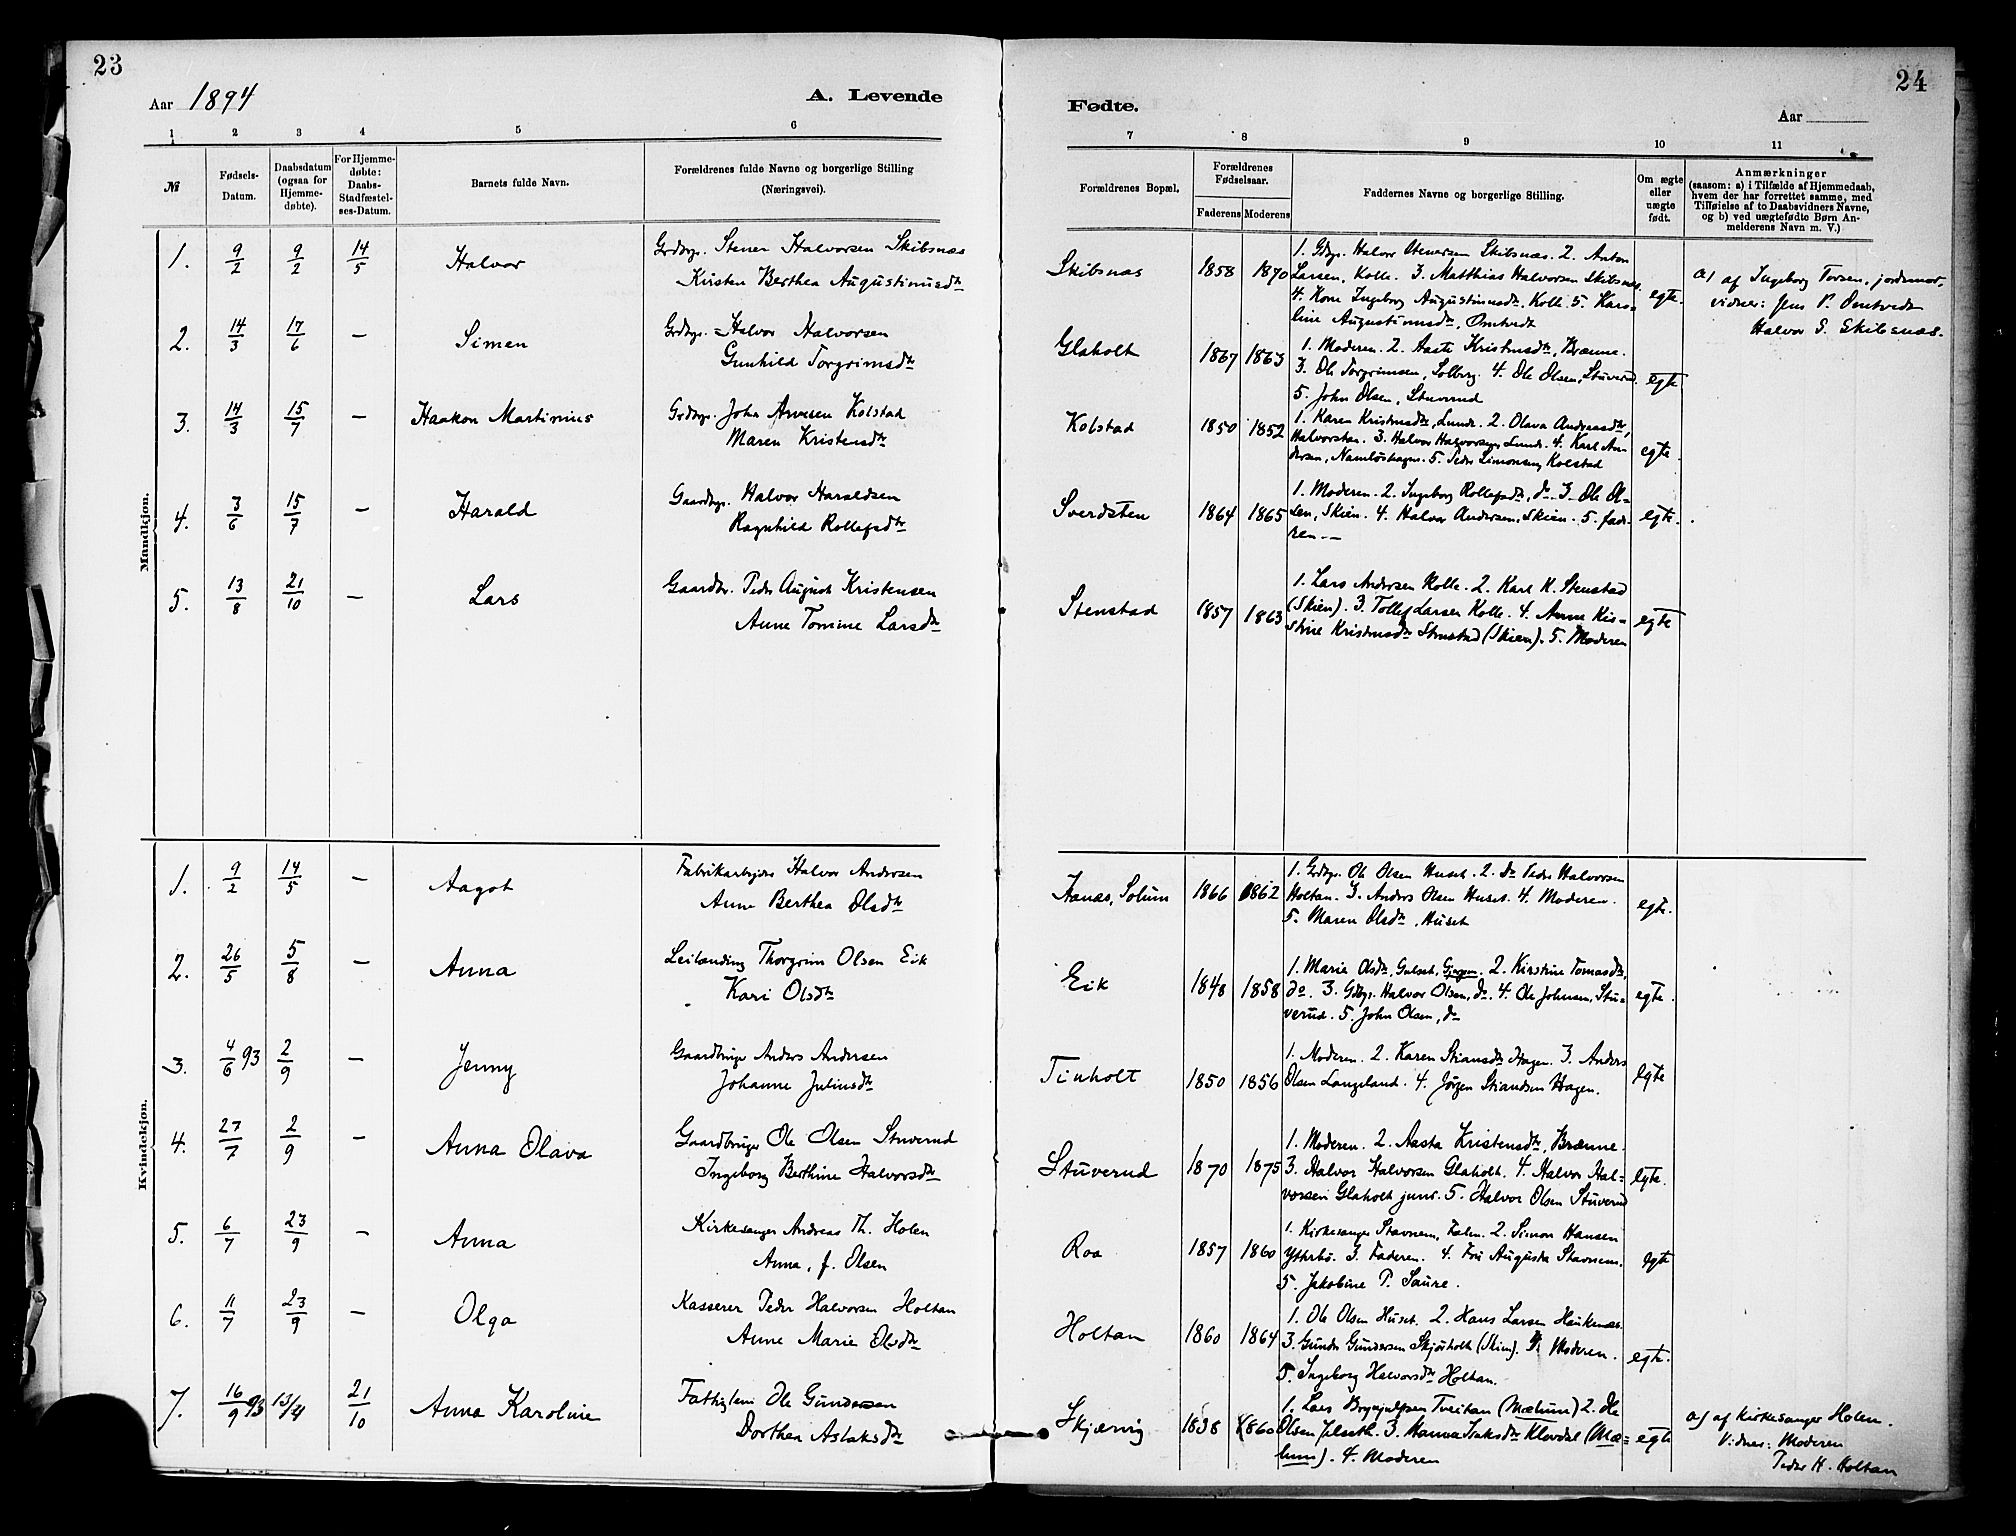 SAKO, Holla kirkebøker, F/Fa/L0009: Ministerialbok nr. 9, 1881-1897, s. 23